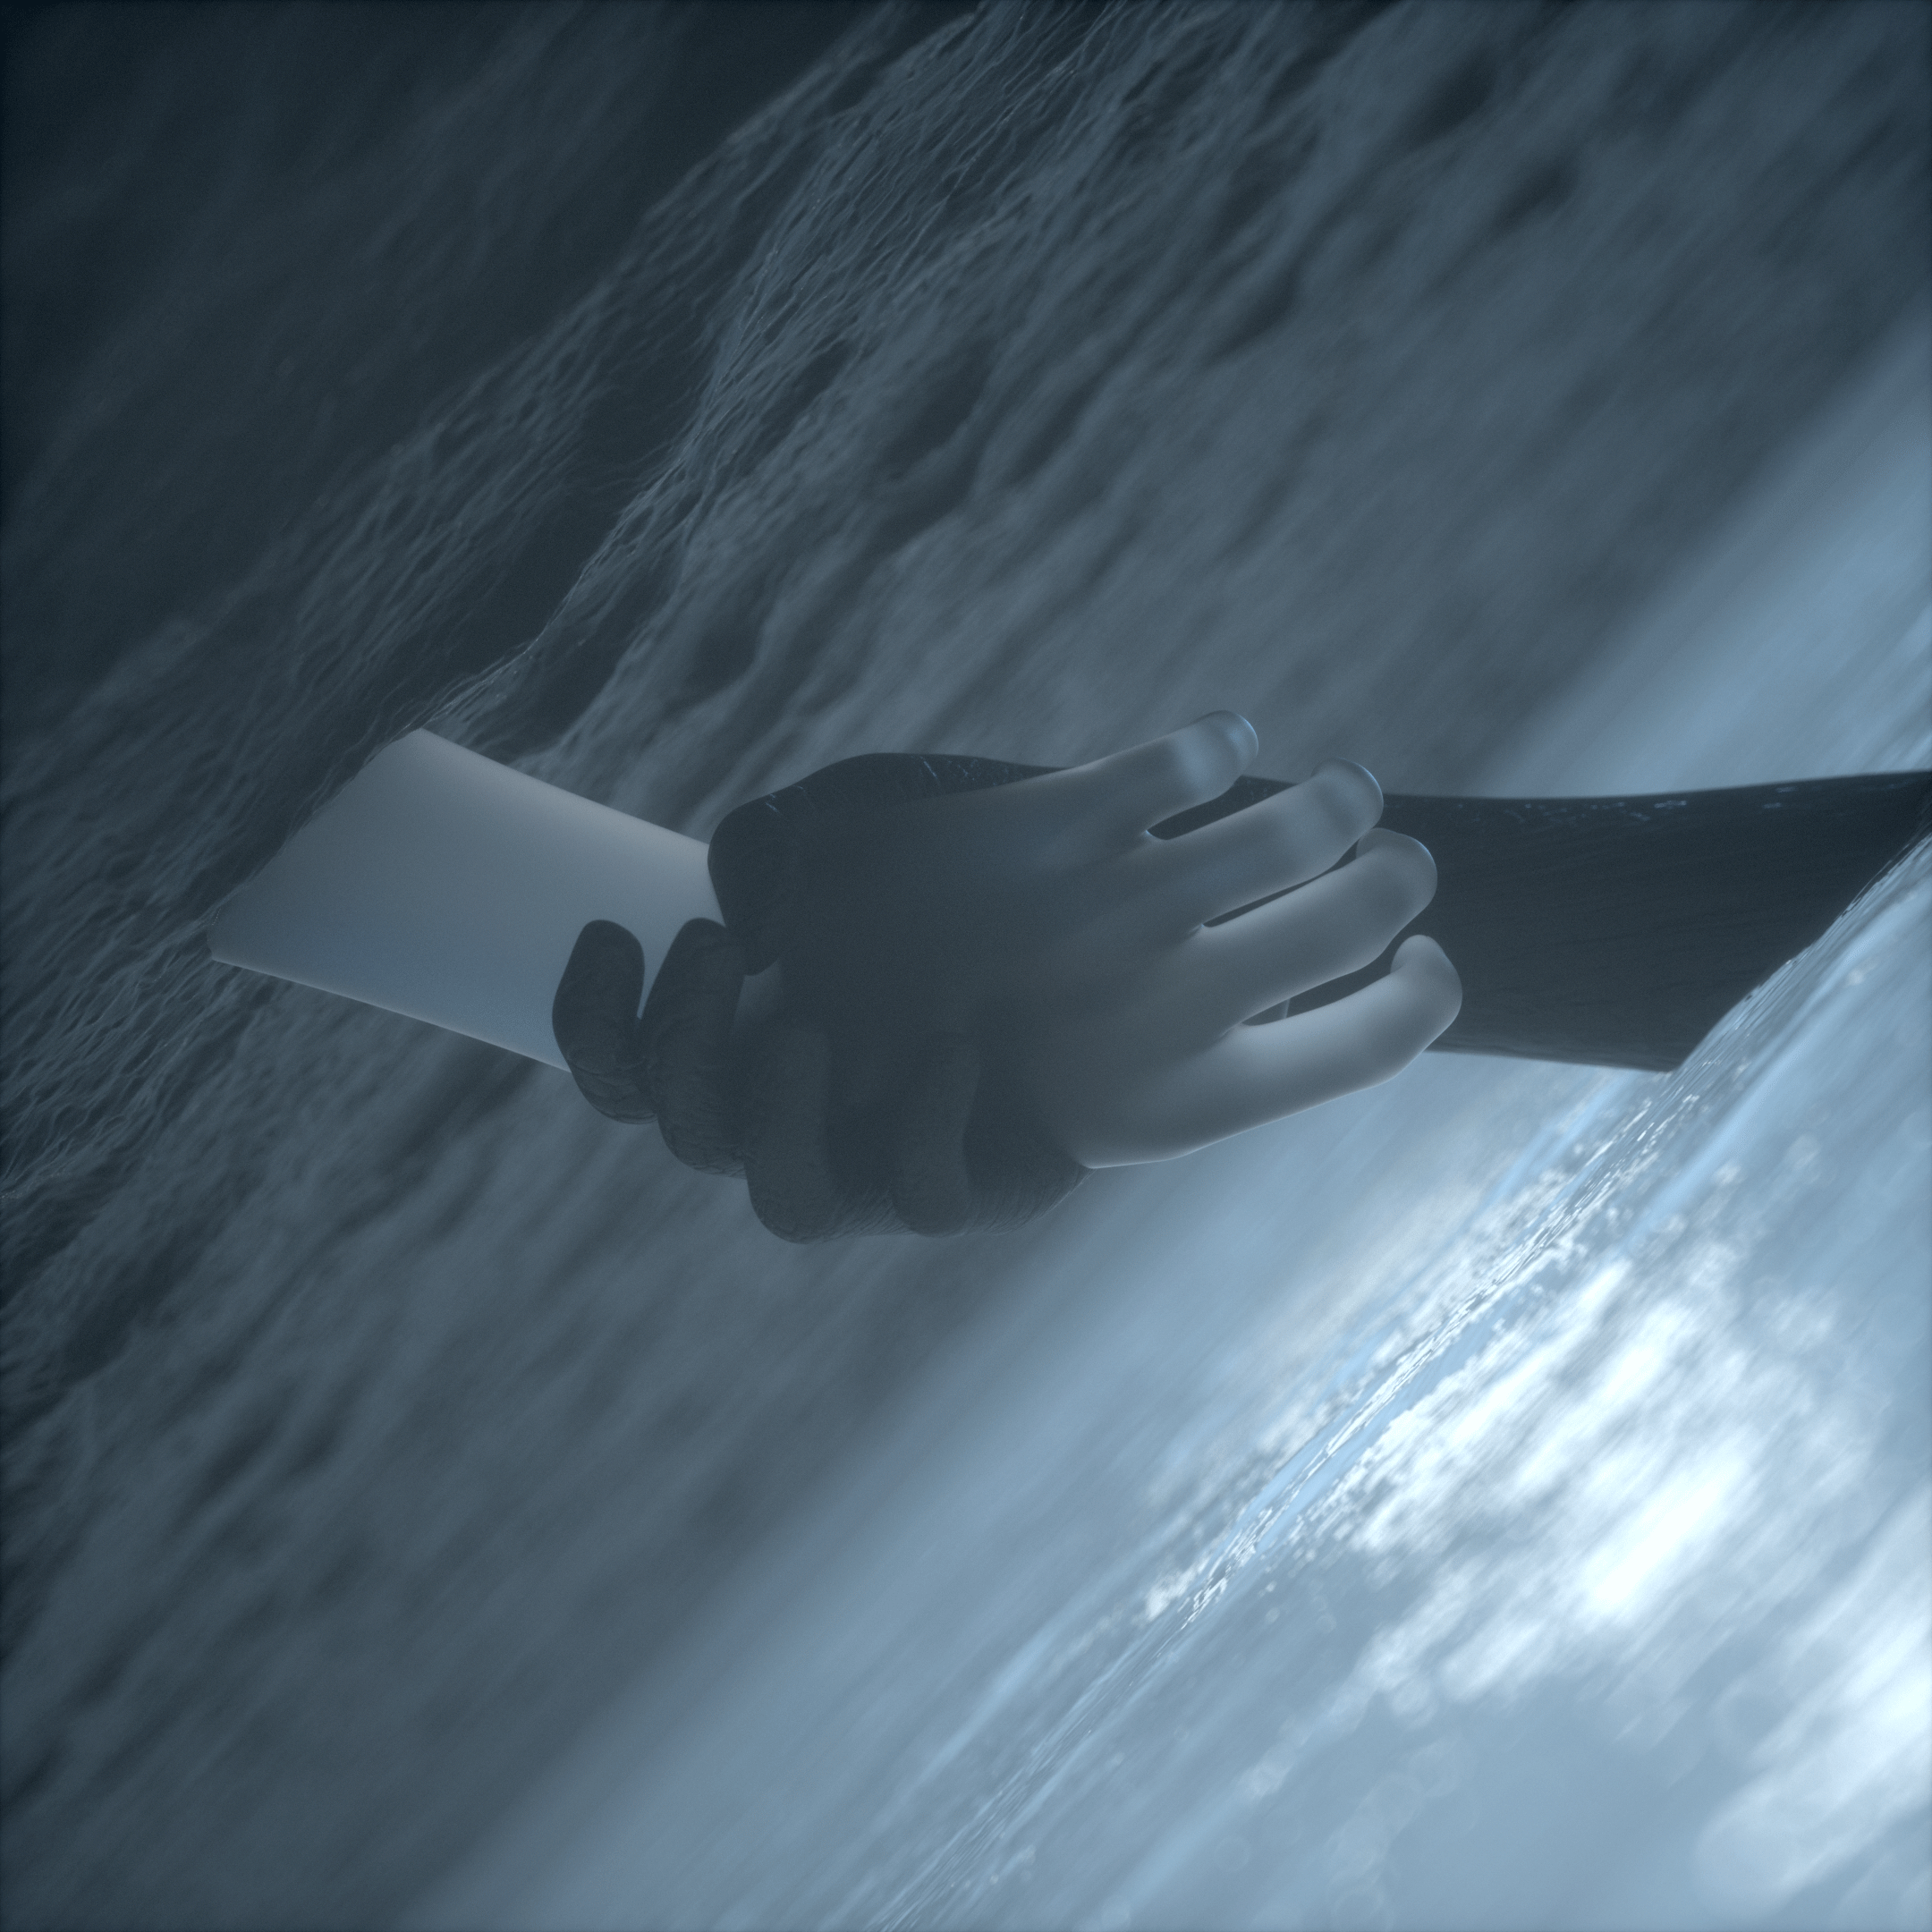 exp_244_11_underwater.png